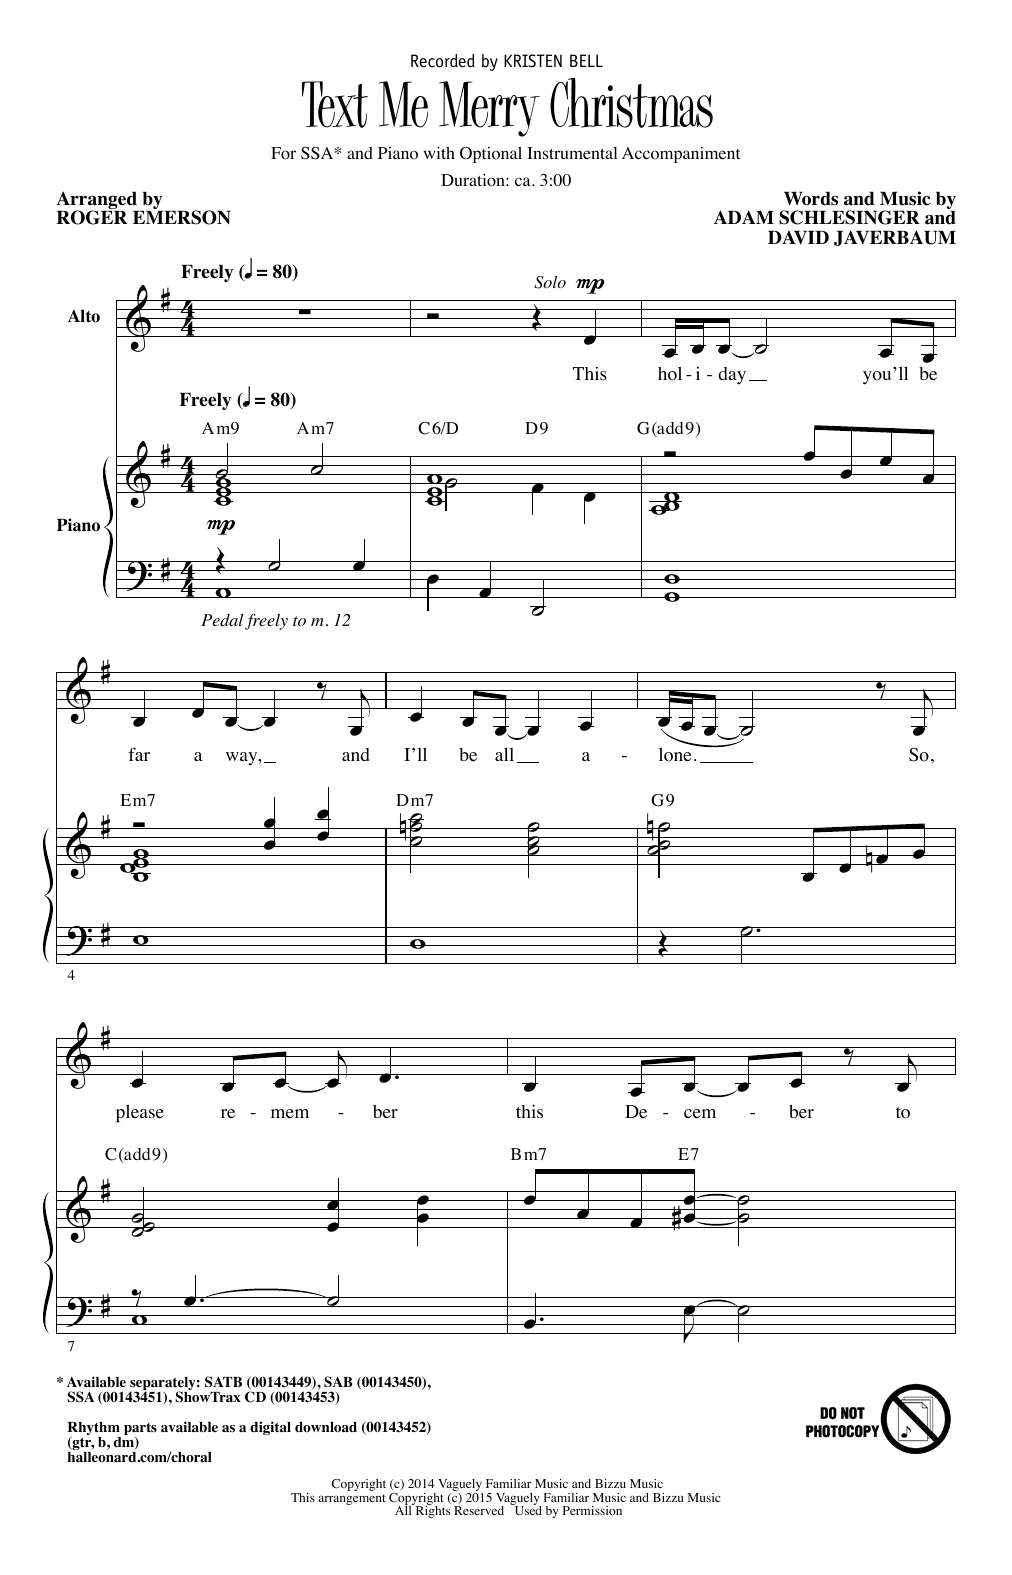 Sheet Music Digital Files To Print - Licensed Kristen Bell Digital ...